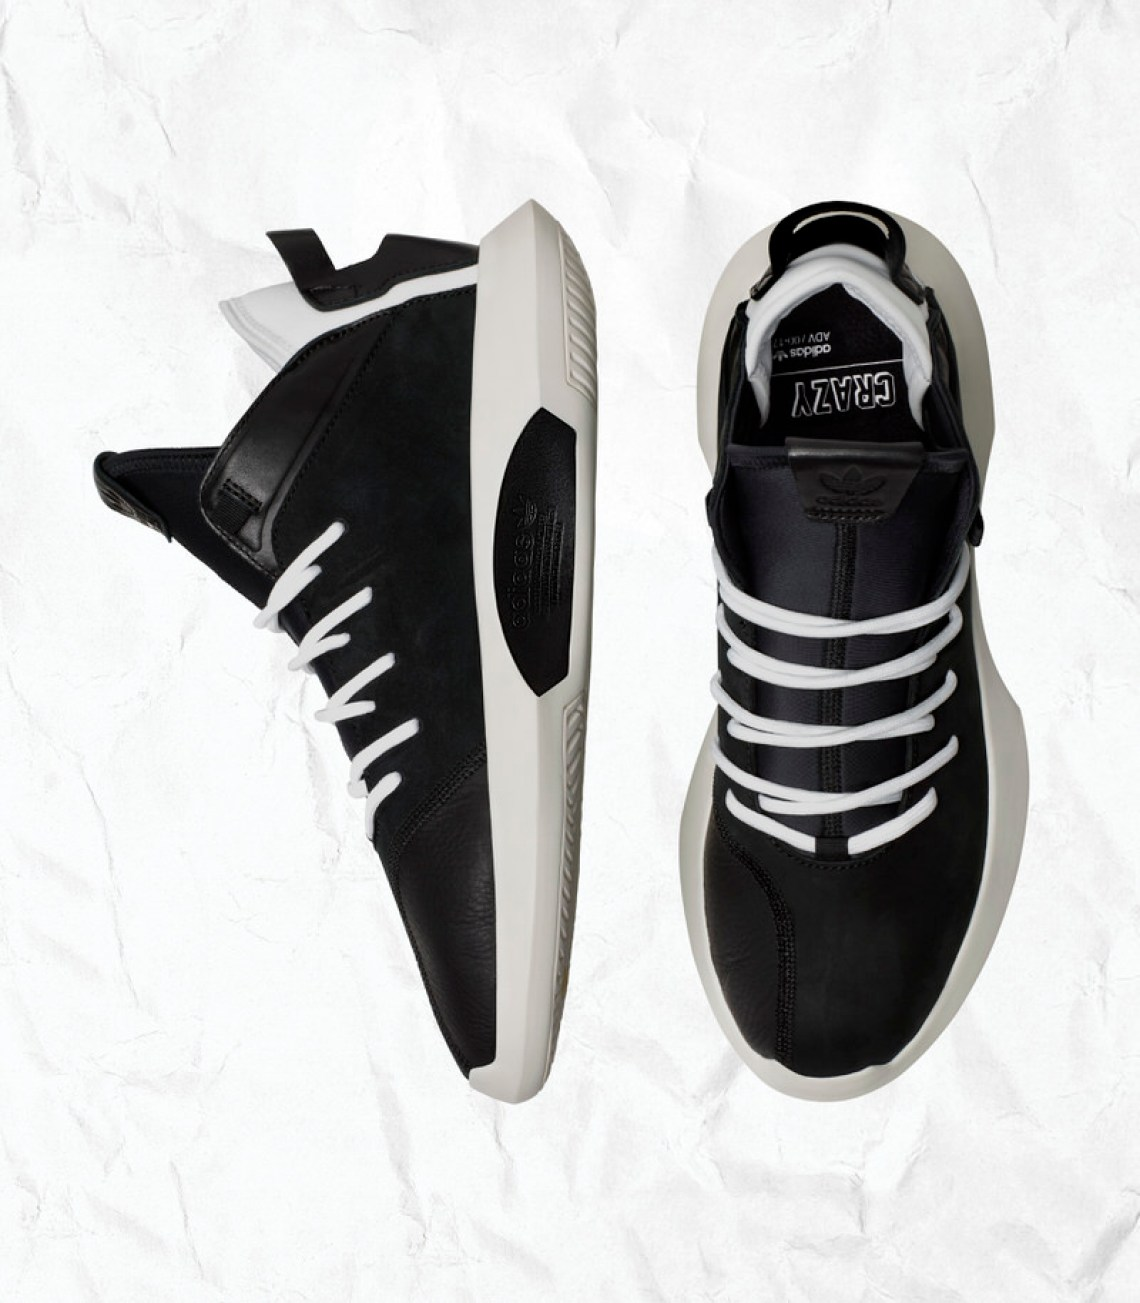 adidas Crazy ADV Black/White